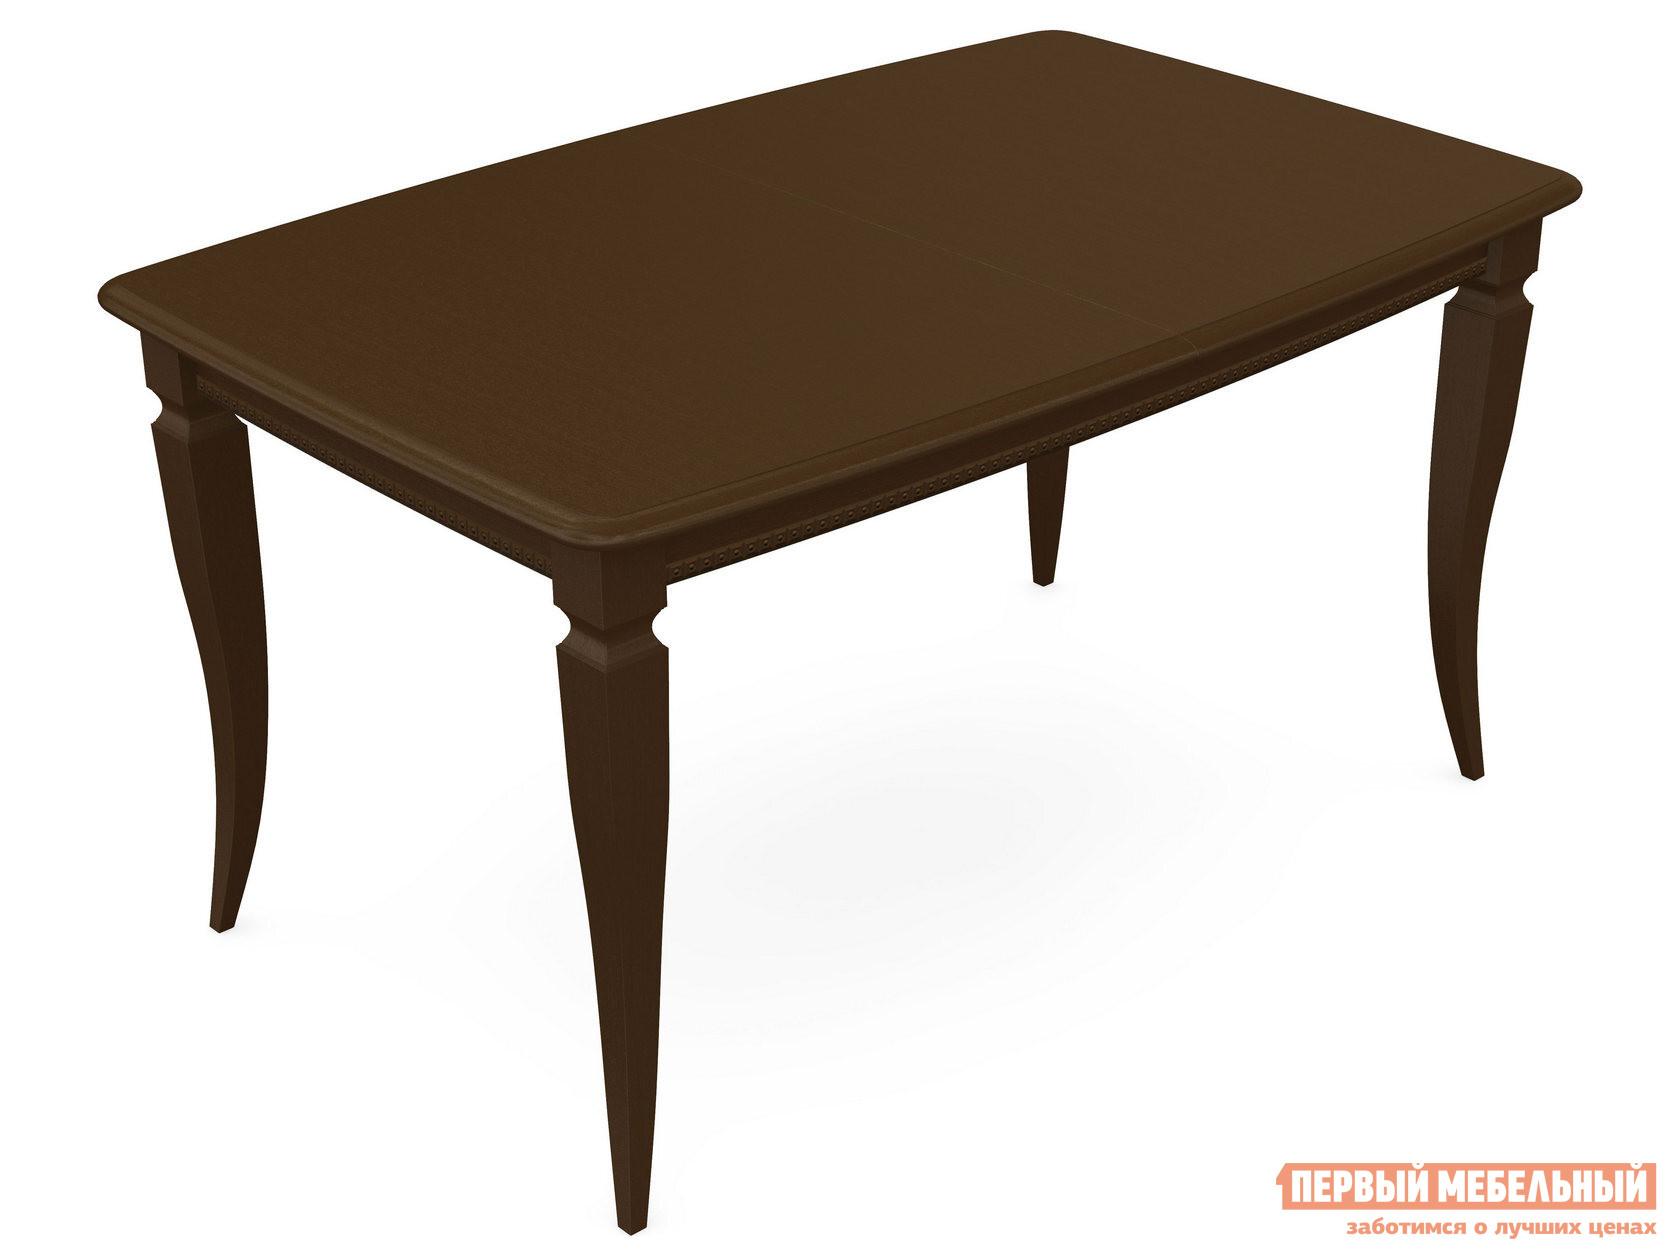 Обеденный стол  Стол Сибарит Тон 4, Коньяк, Малый